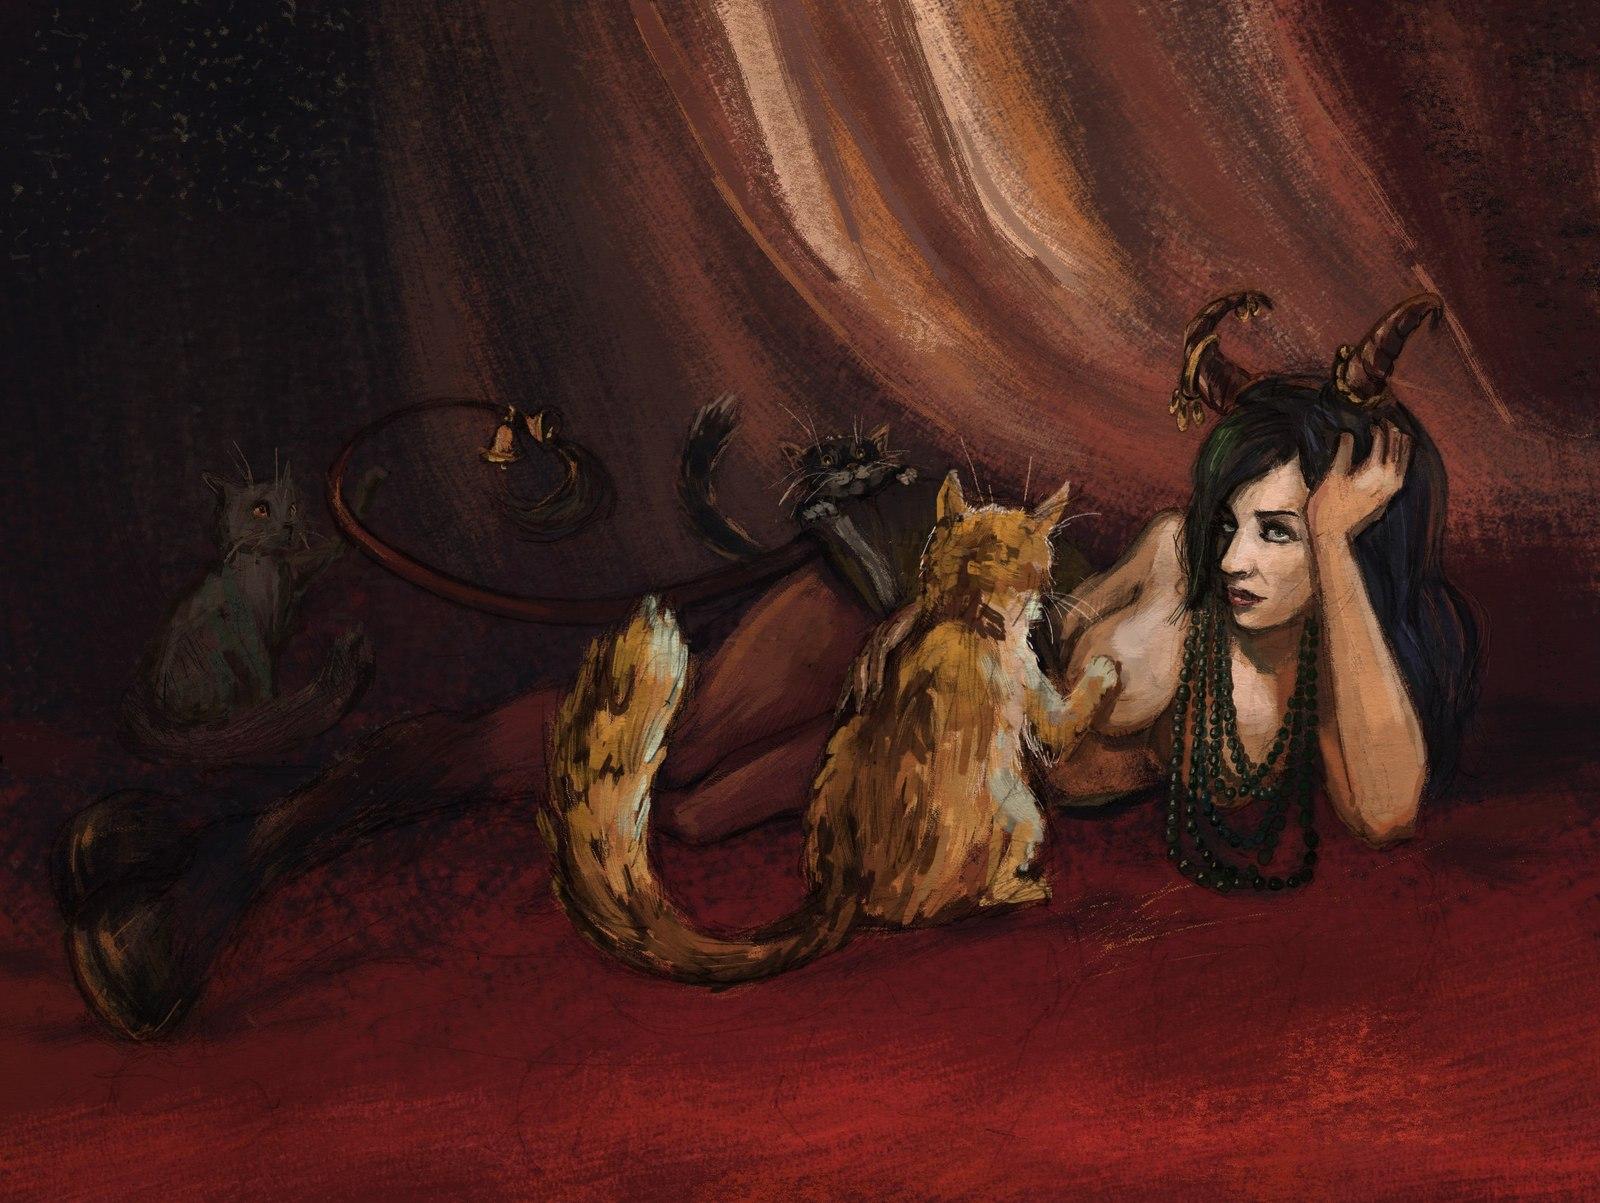 image (4) (2).jpg - Witcher 3: Wild Hunt, the